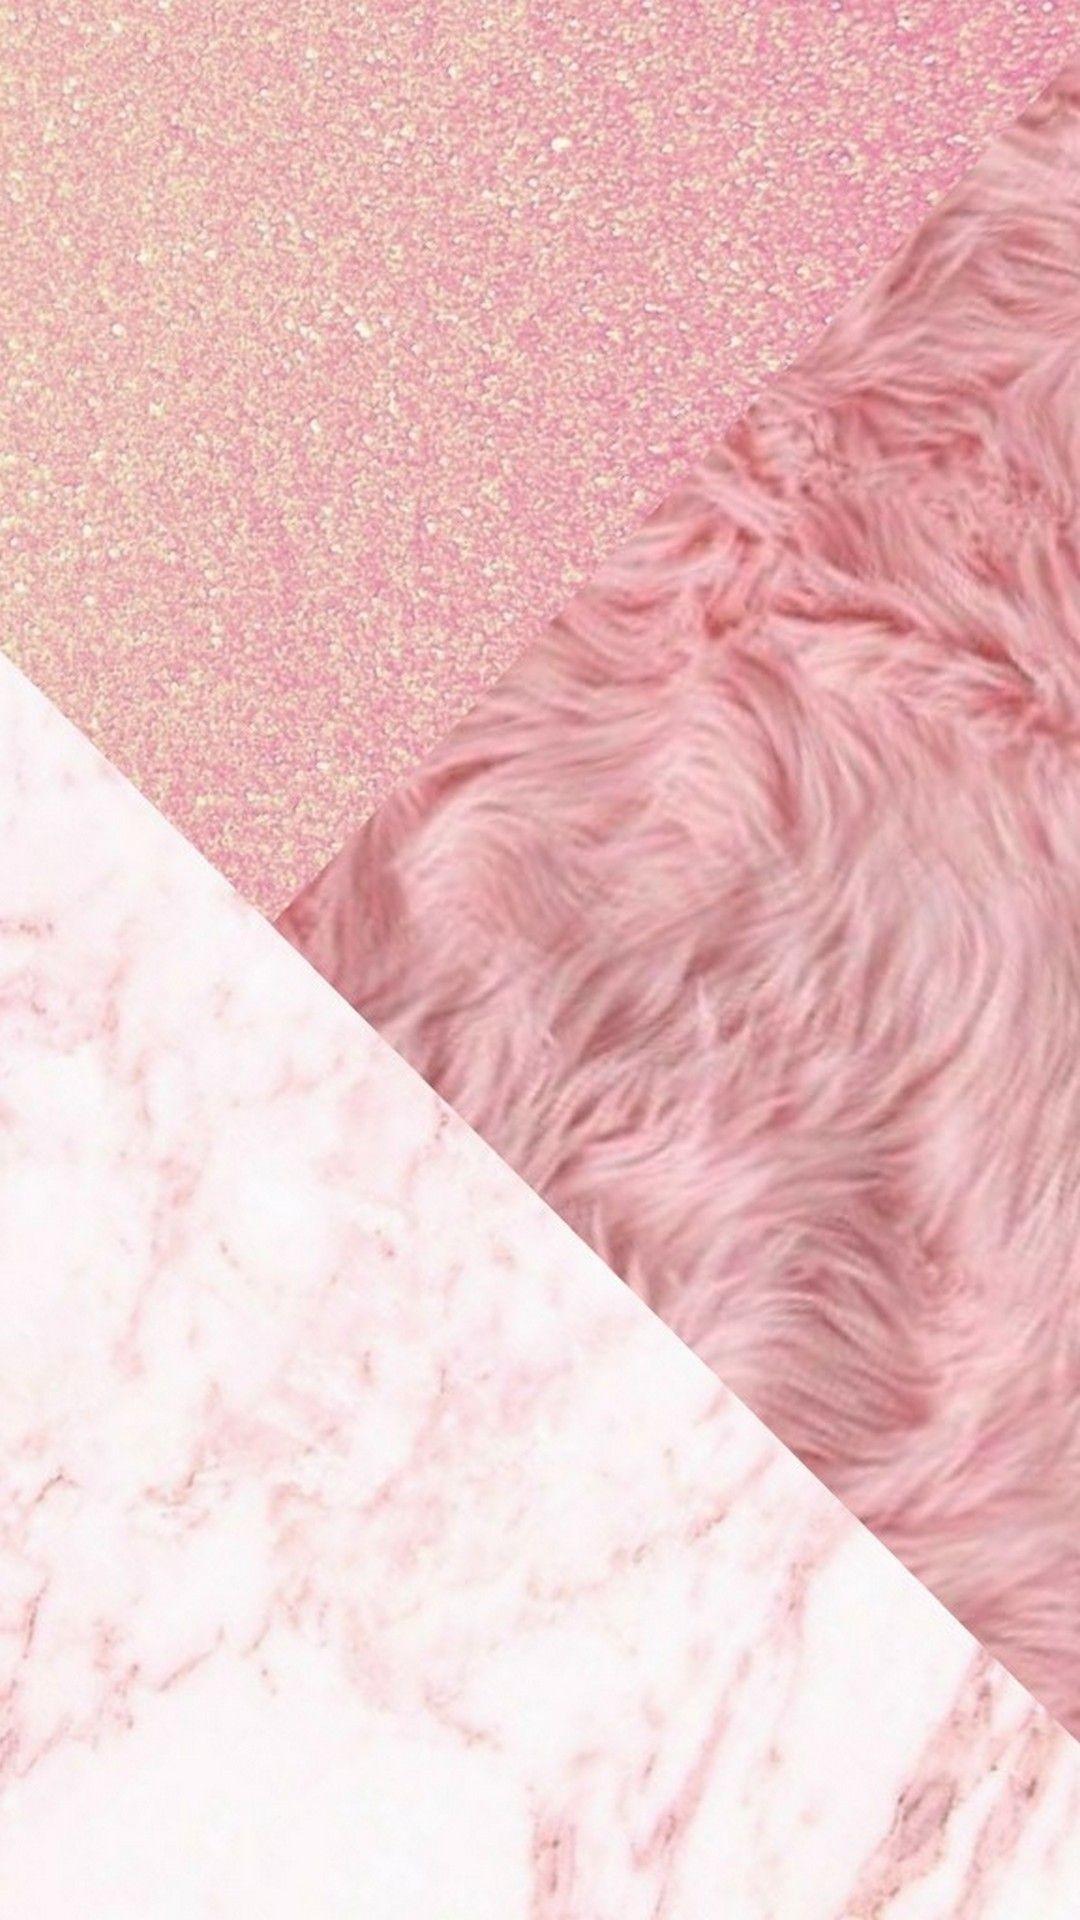 Res: 1080x1920, Wallpaper iPhone Rose Gold Glitter - Best iPhone Wallpaper #IphoneWallpapers